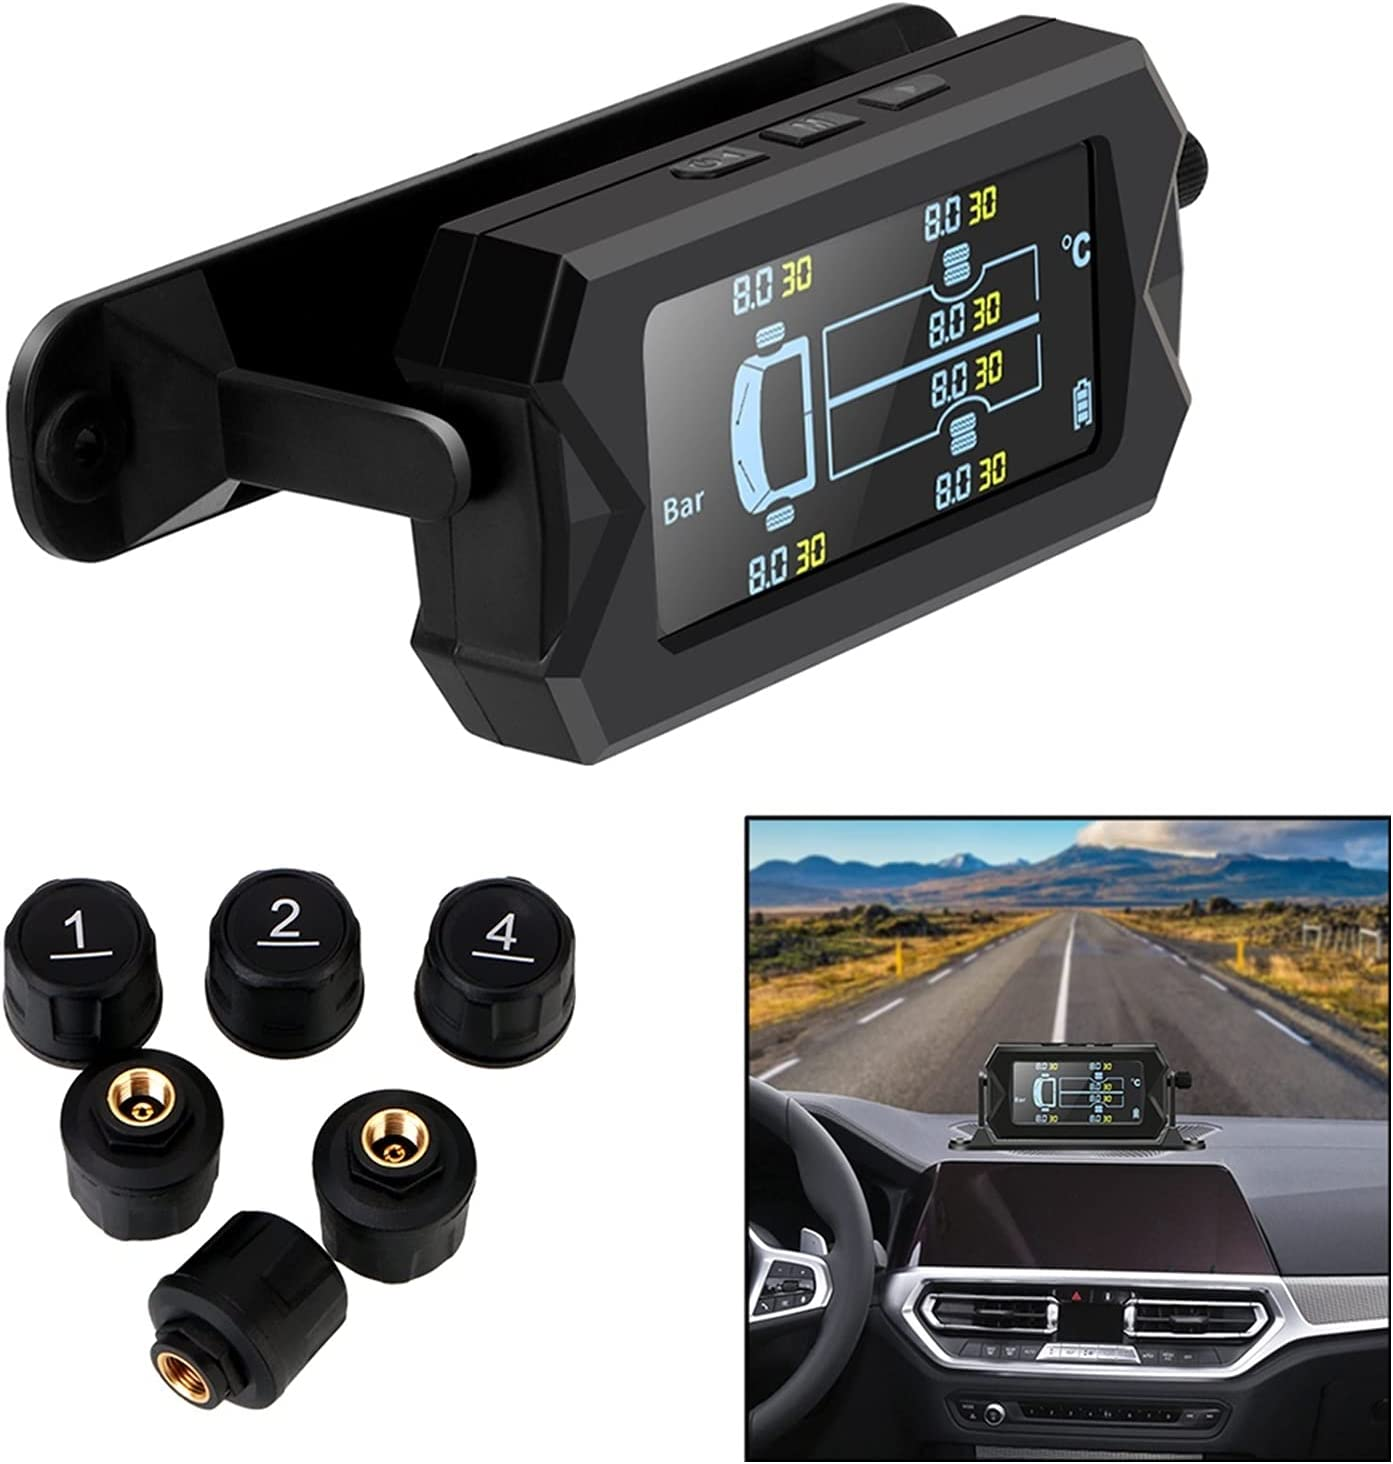 Coche RV Camión TPMS Digital LCD Sistema de monitoreo de presión de neumáticos solares inalámbricos de alarma con 6 sensores externos